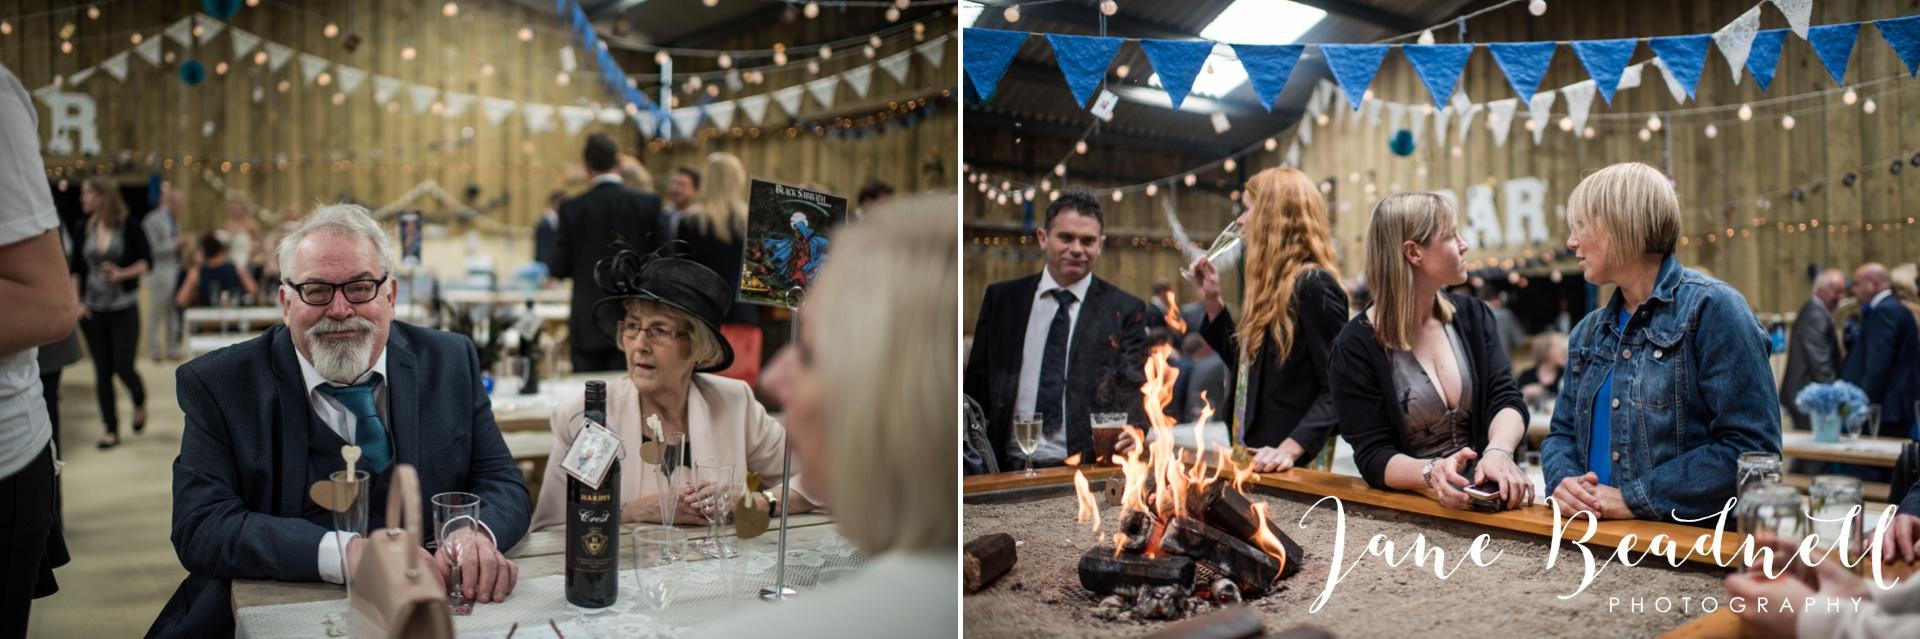 Hill Top Farm Wedding Photography Masham by Jane Beadnell Photography_0082